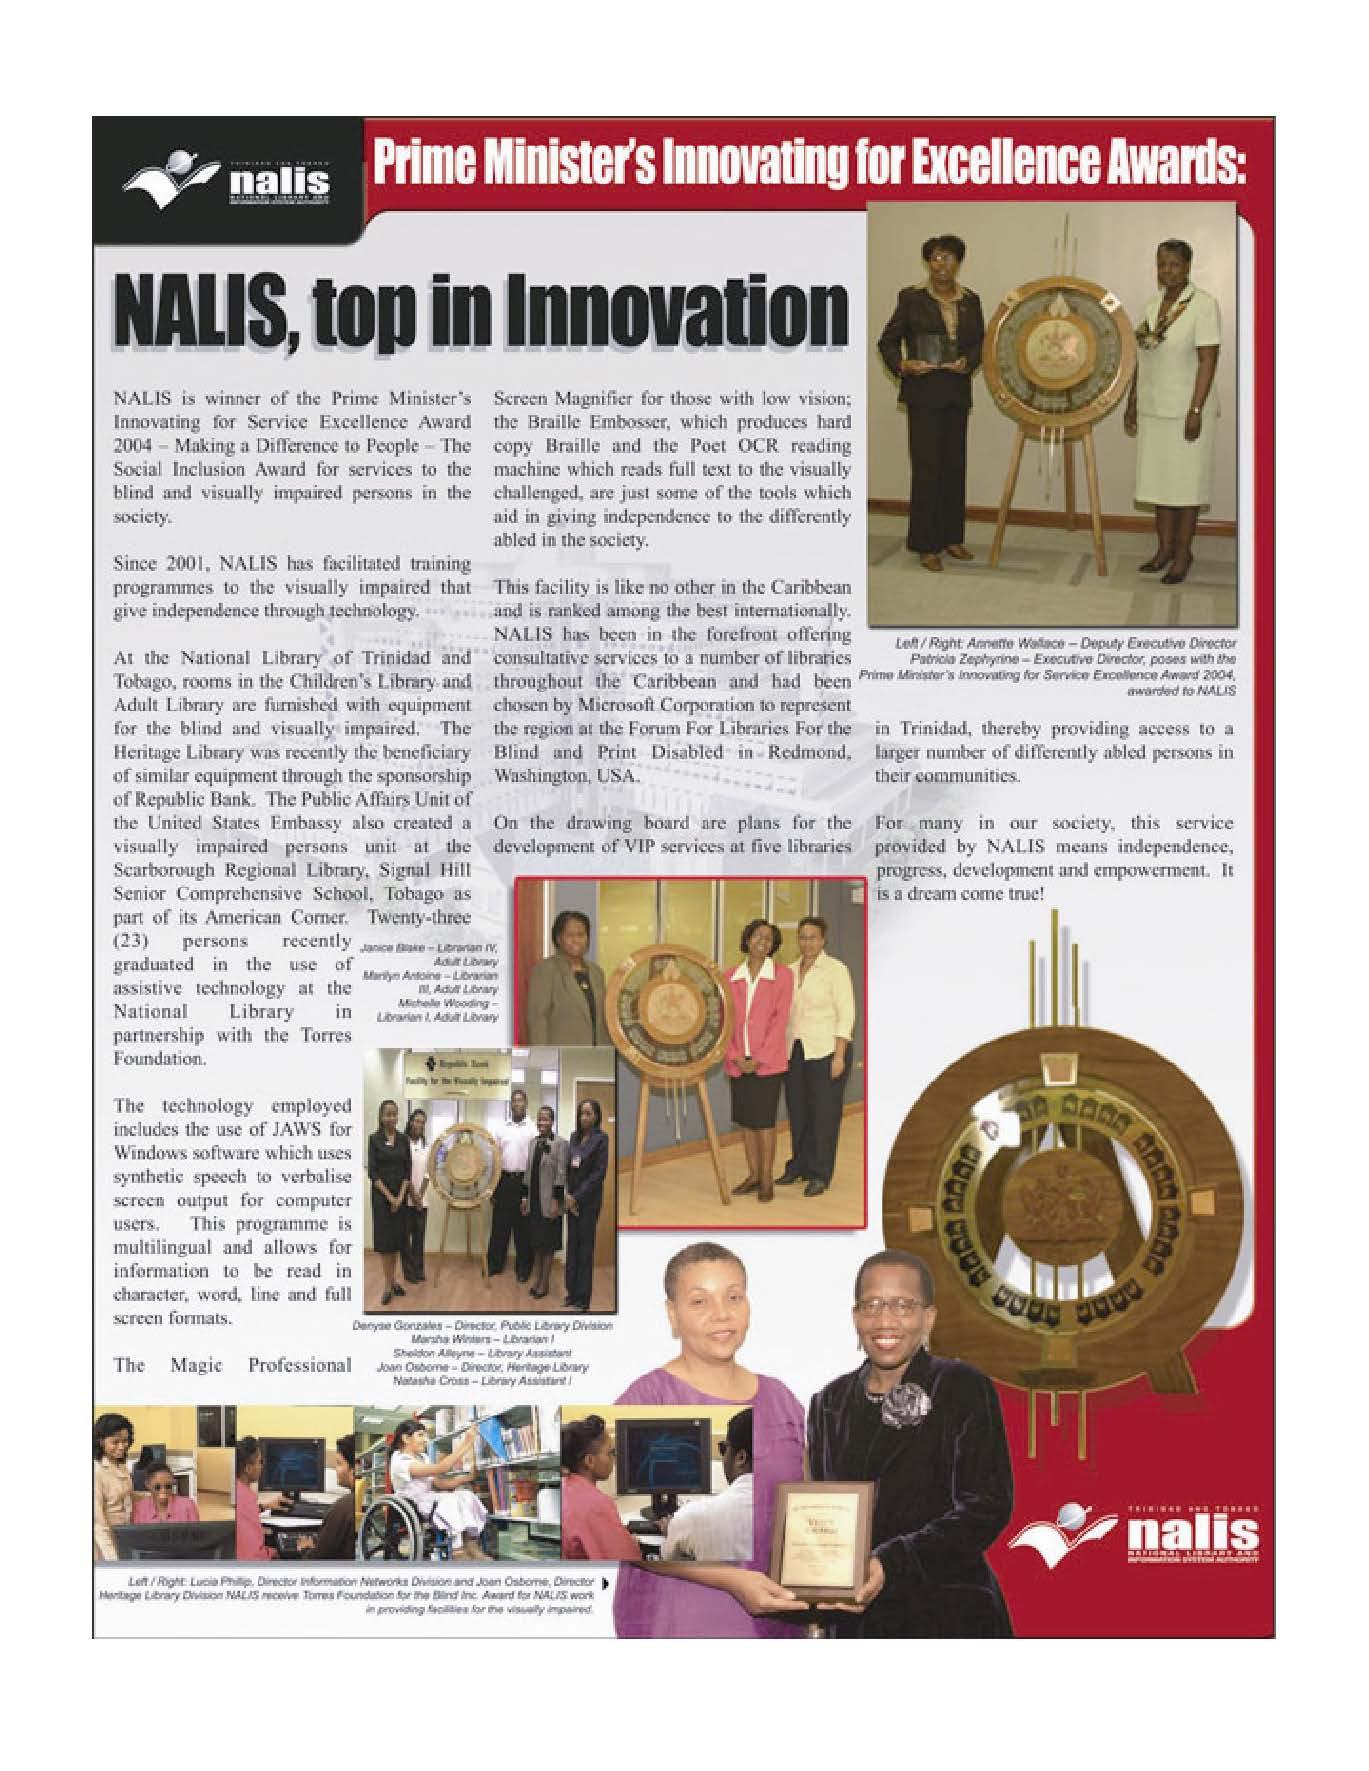 NALIS Prime Minister Award